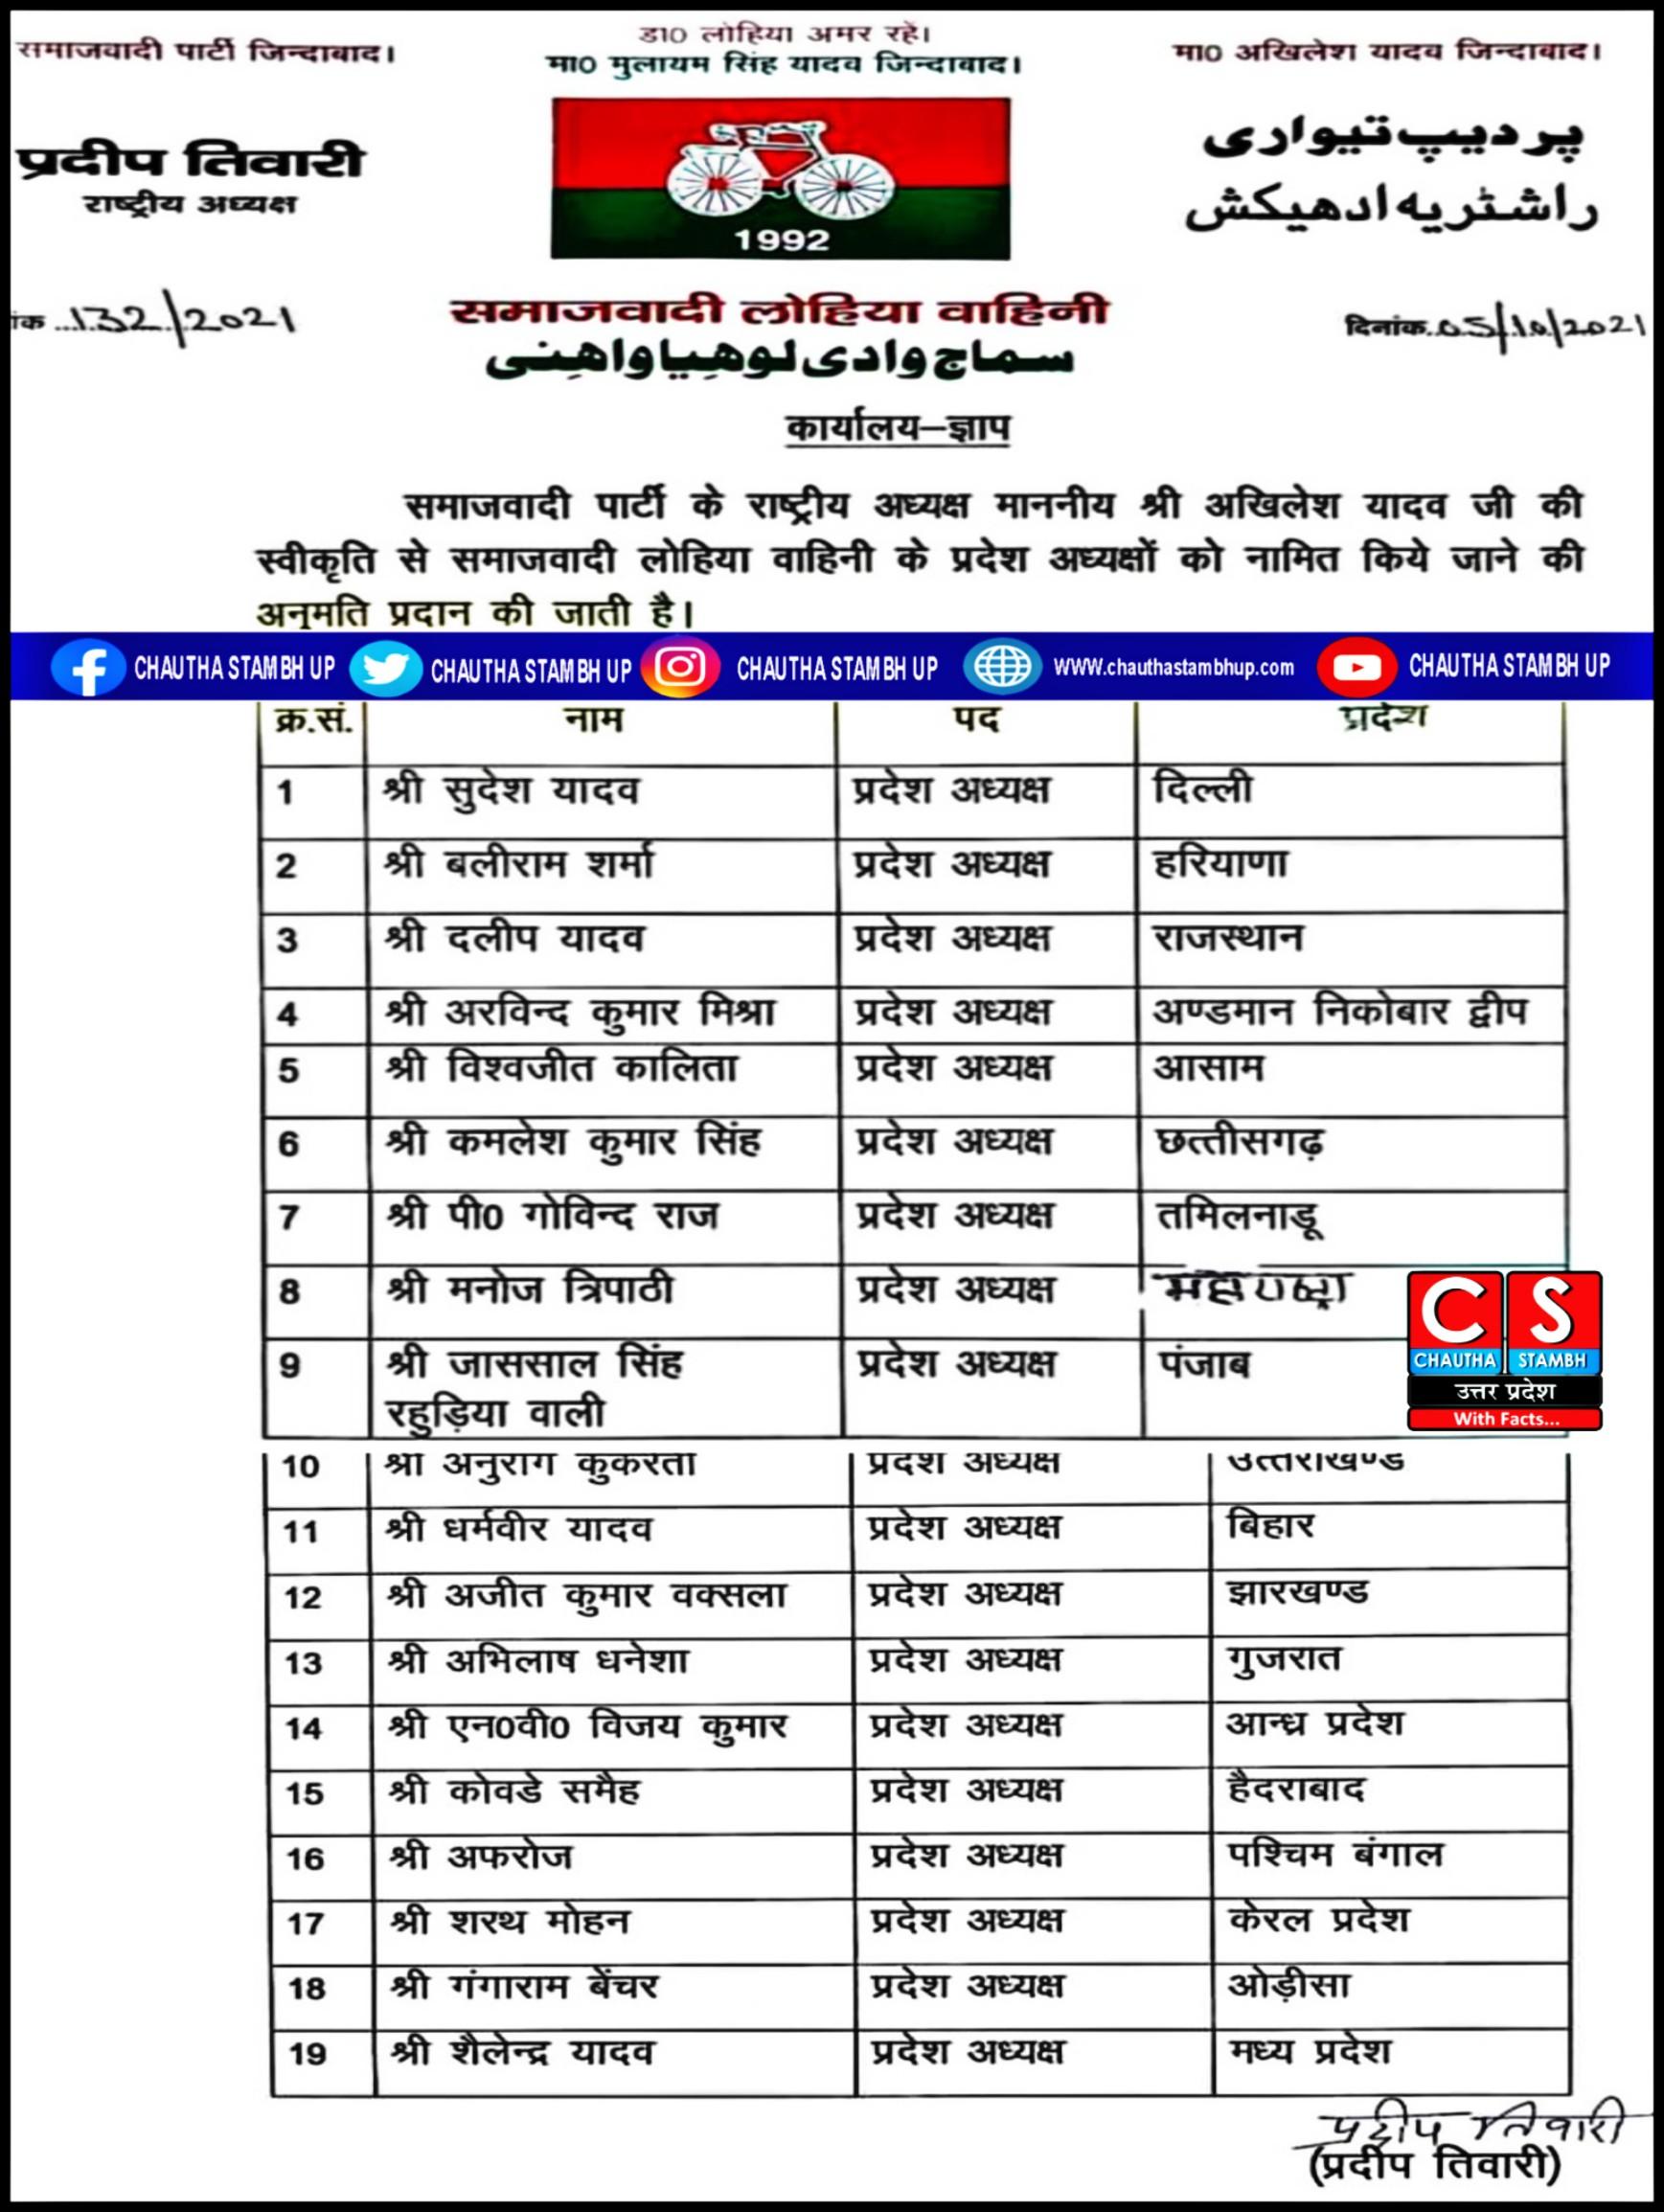 Samajwadi Lohia Vahini news